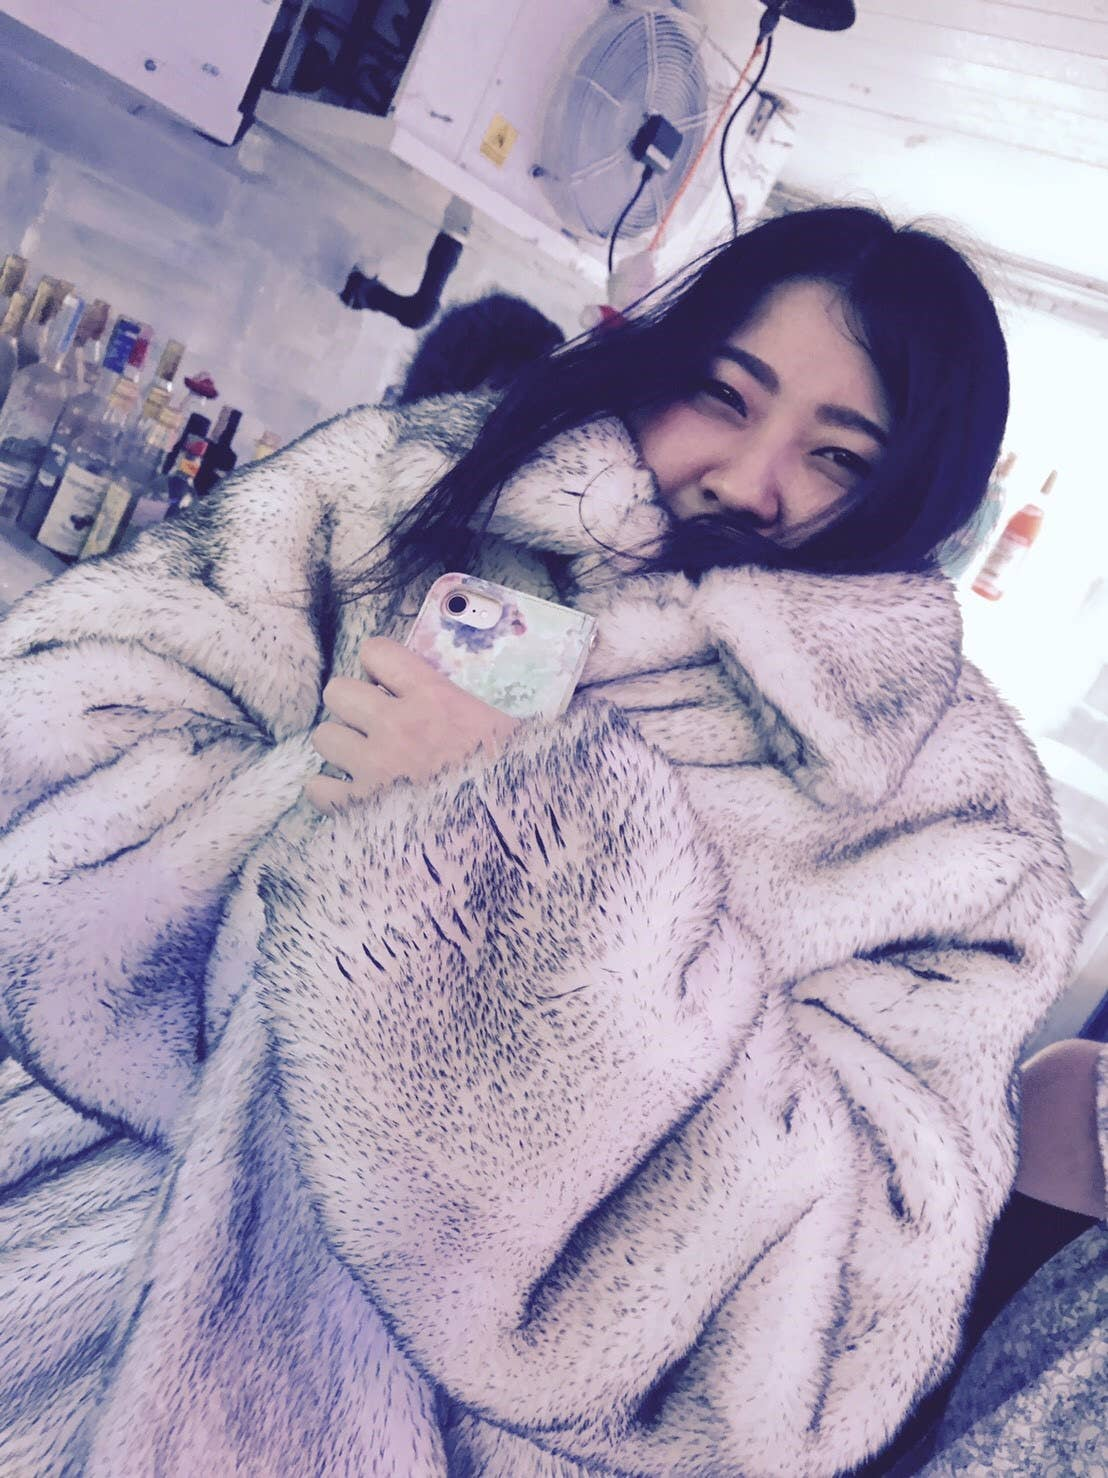 Natsumi Daigo